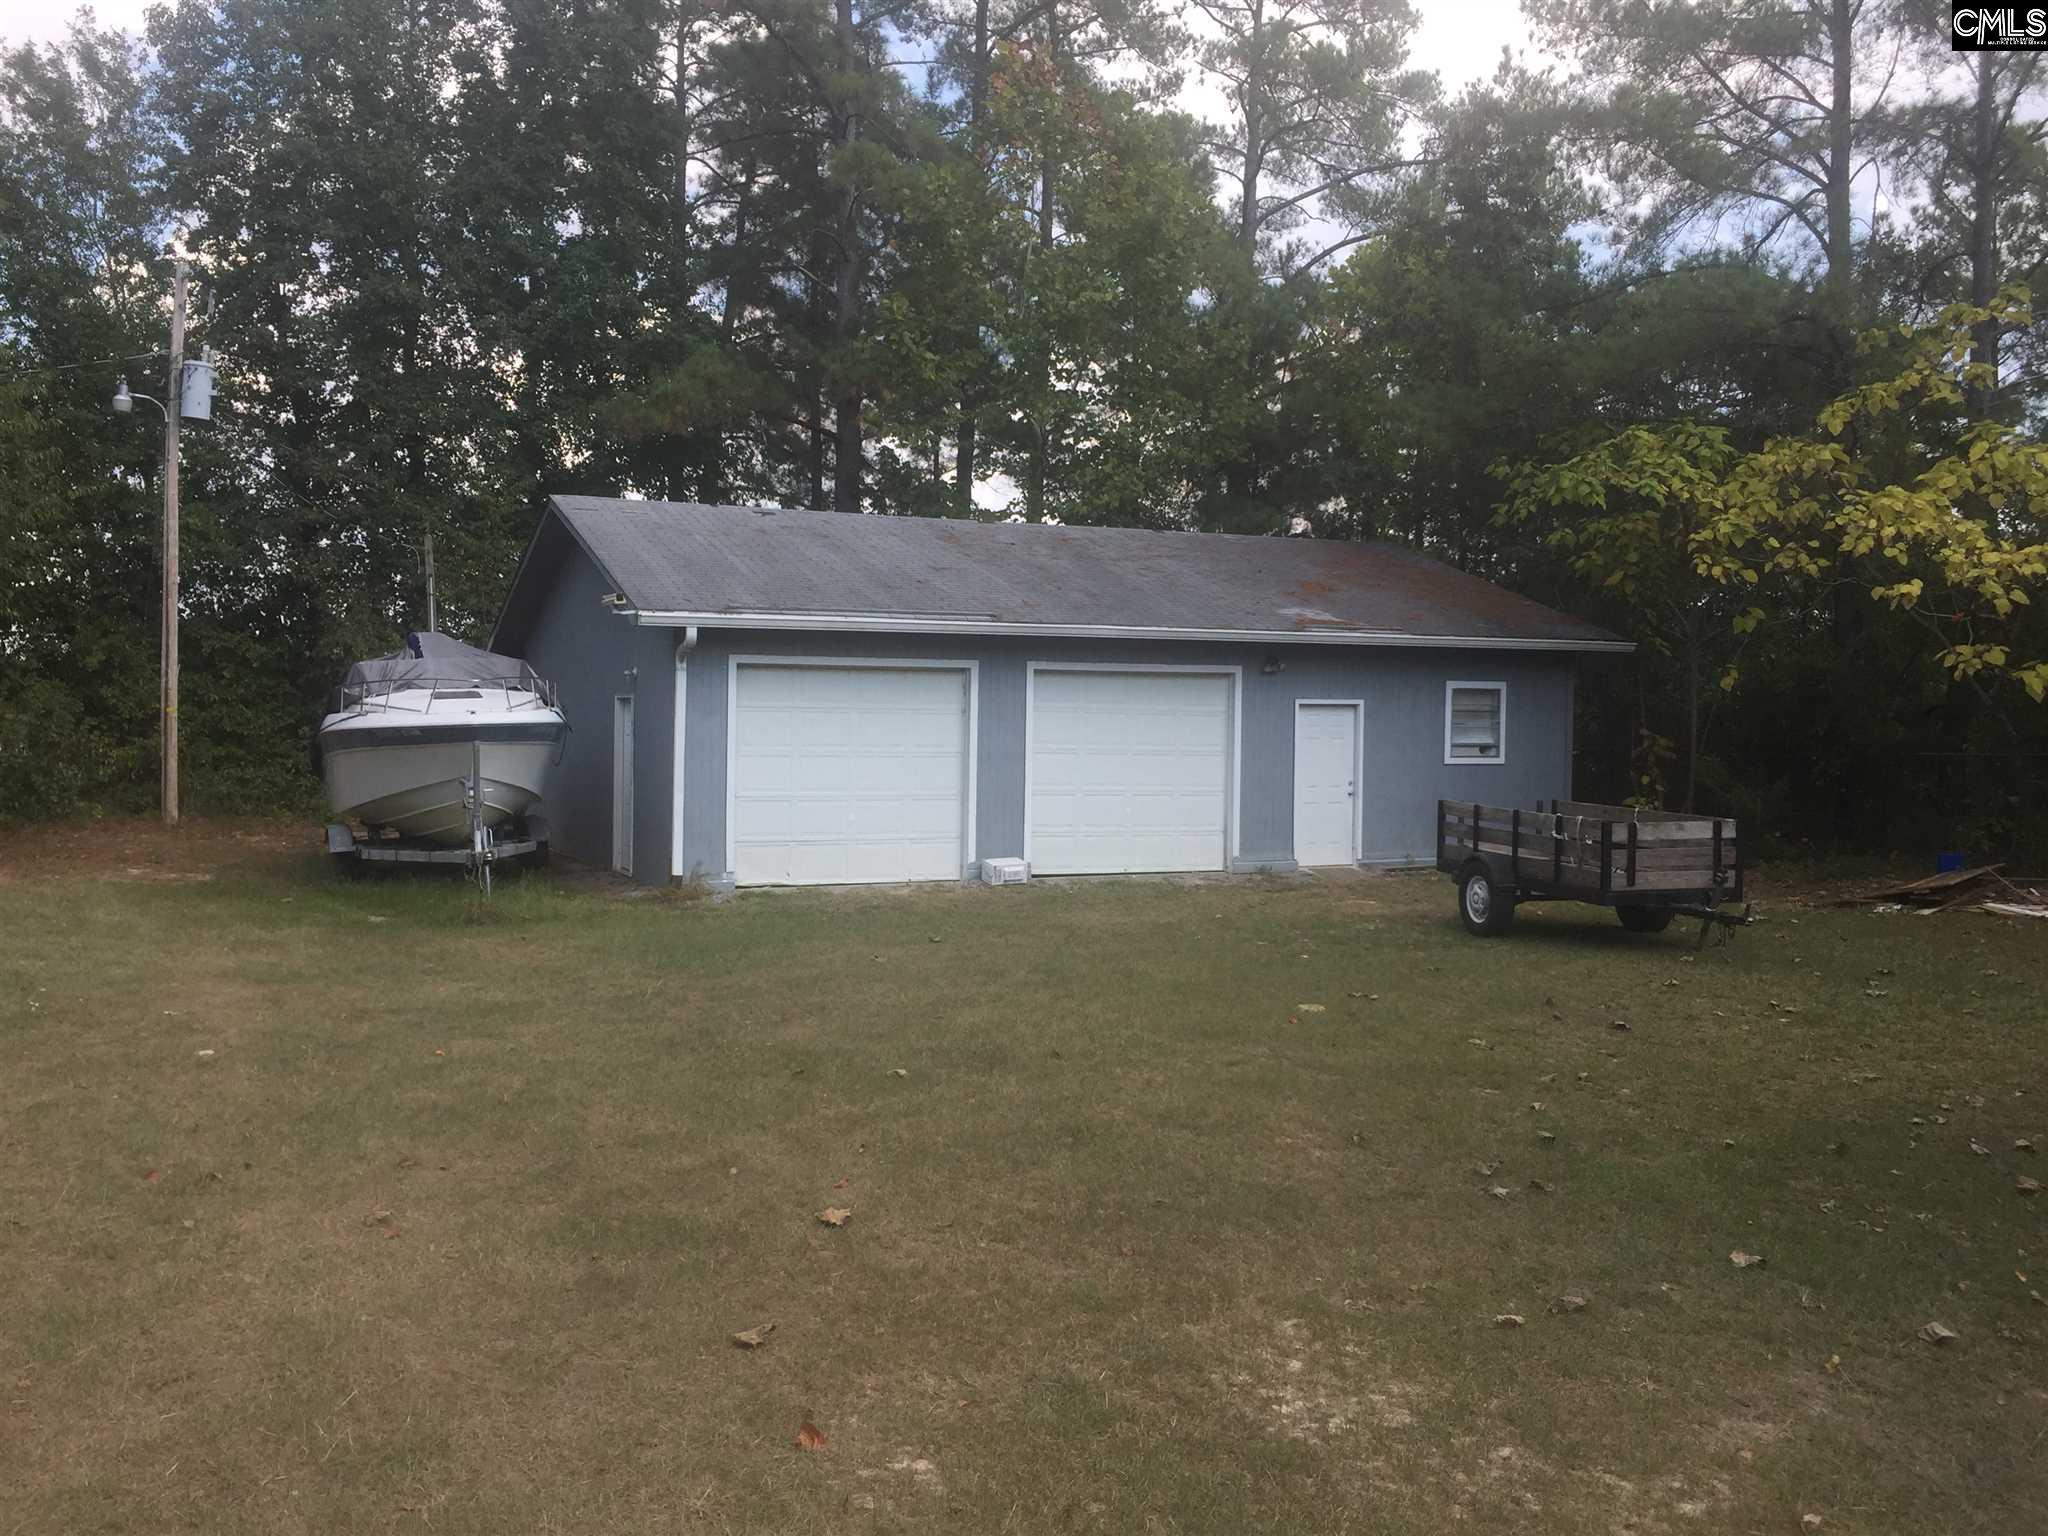 2216 Pine West Columbia, SC 29170-1442